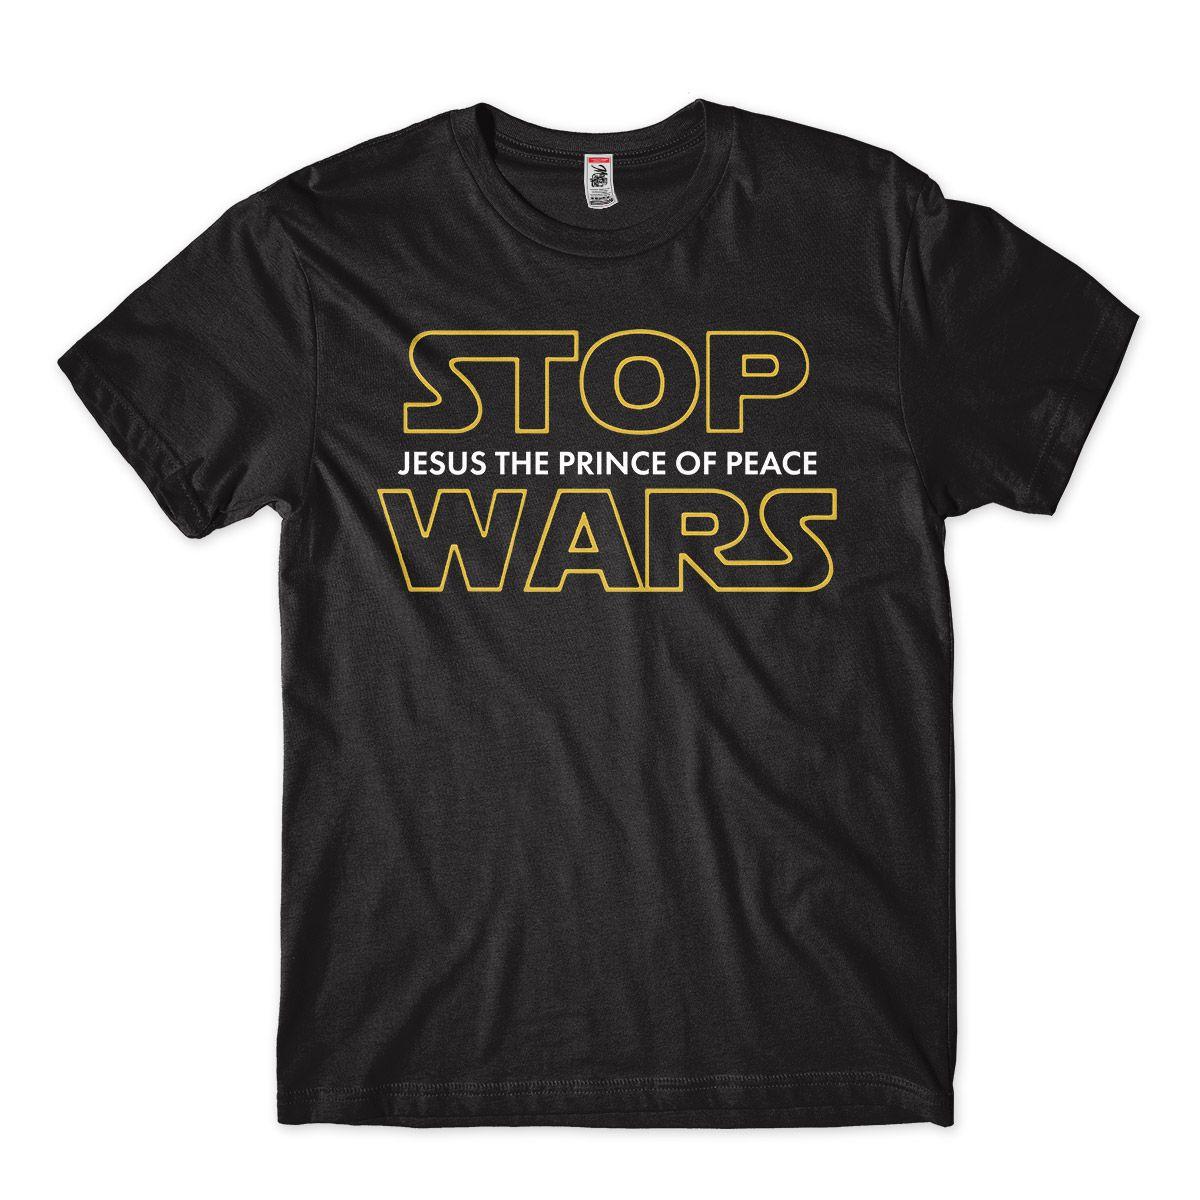 Camiseta Evangelica Camisa Gospel Star Wars Jesus Stop Wars